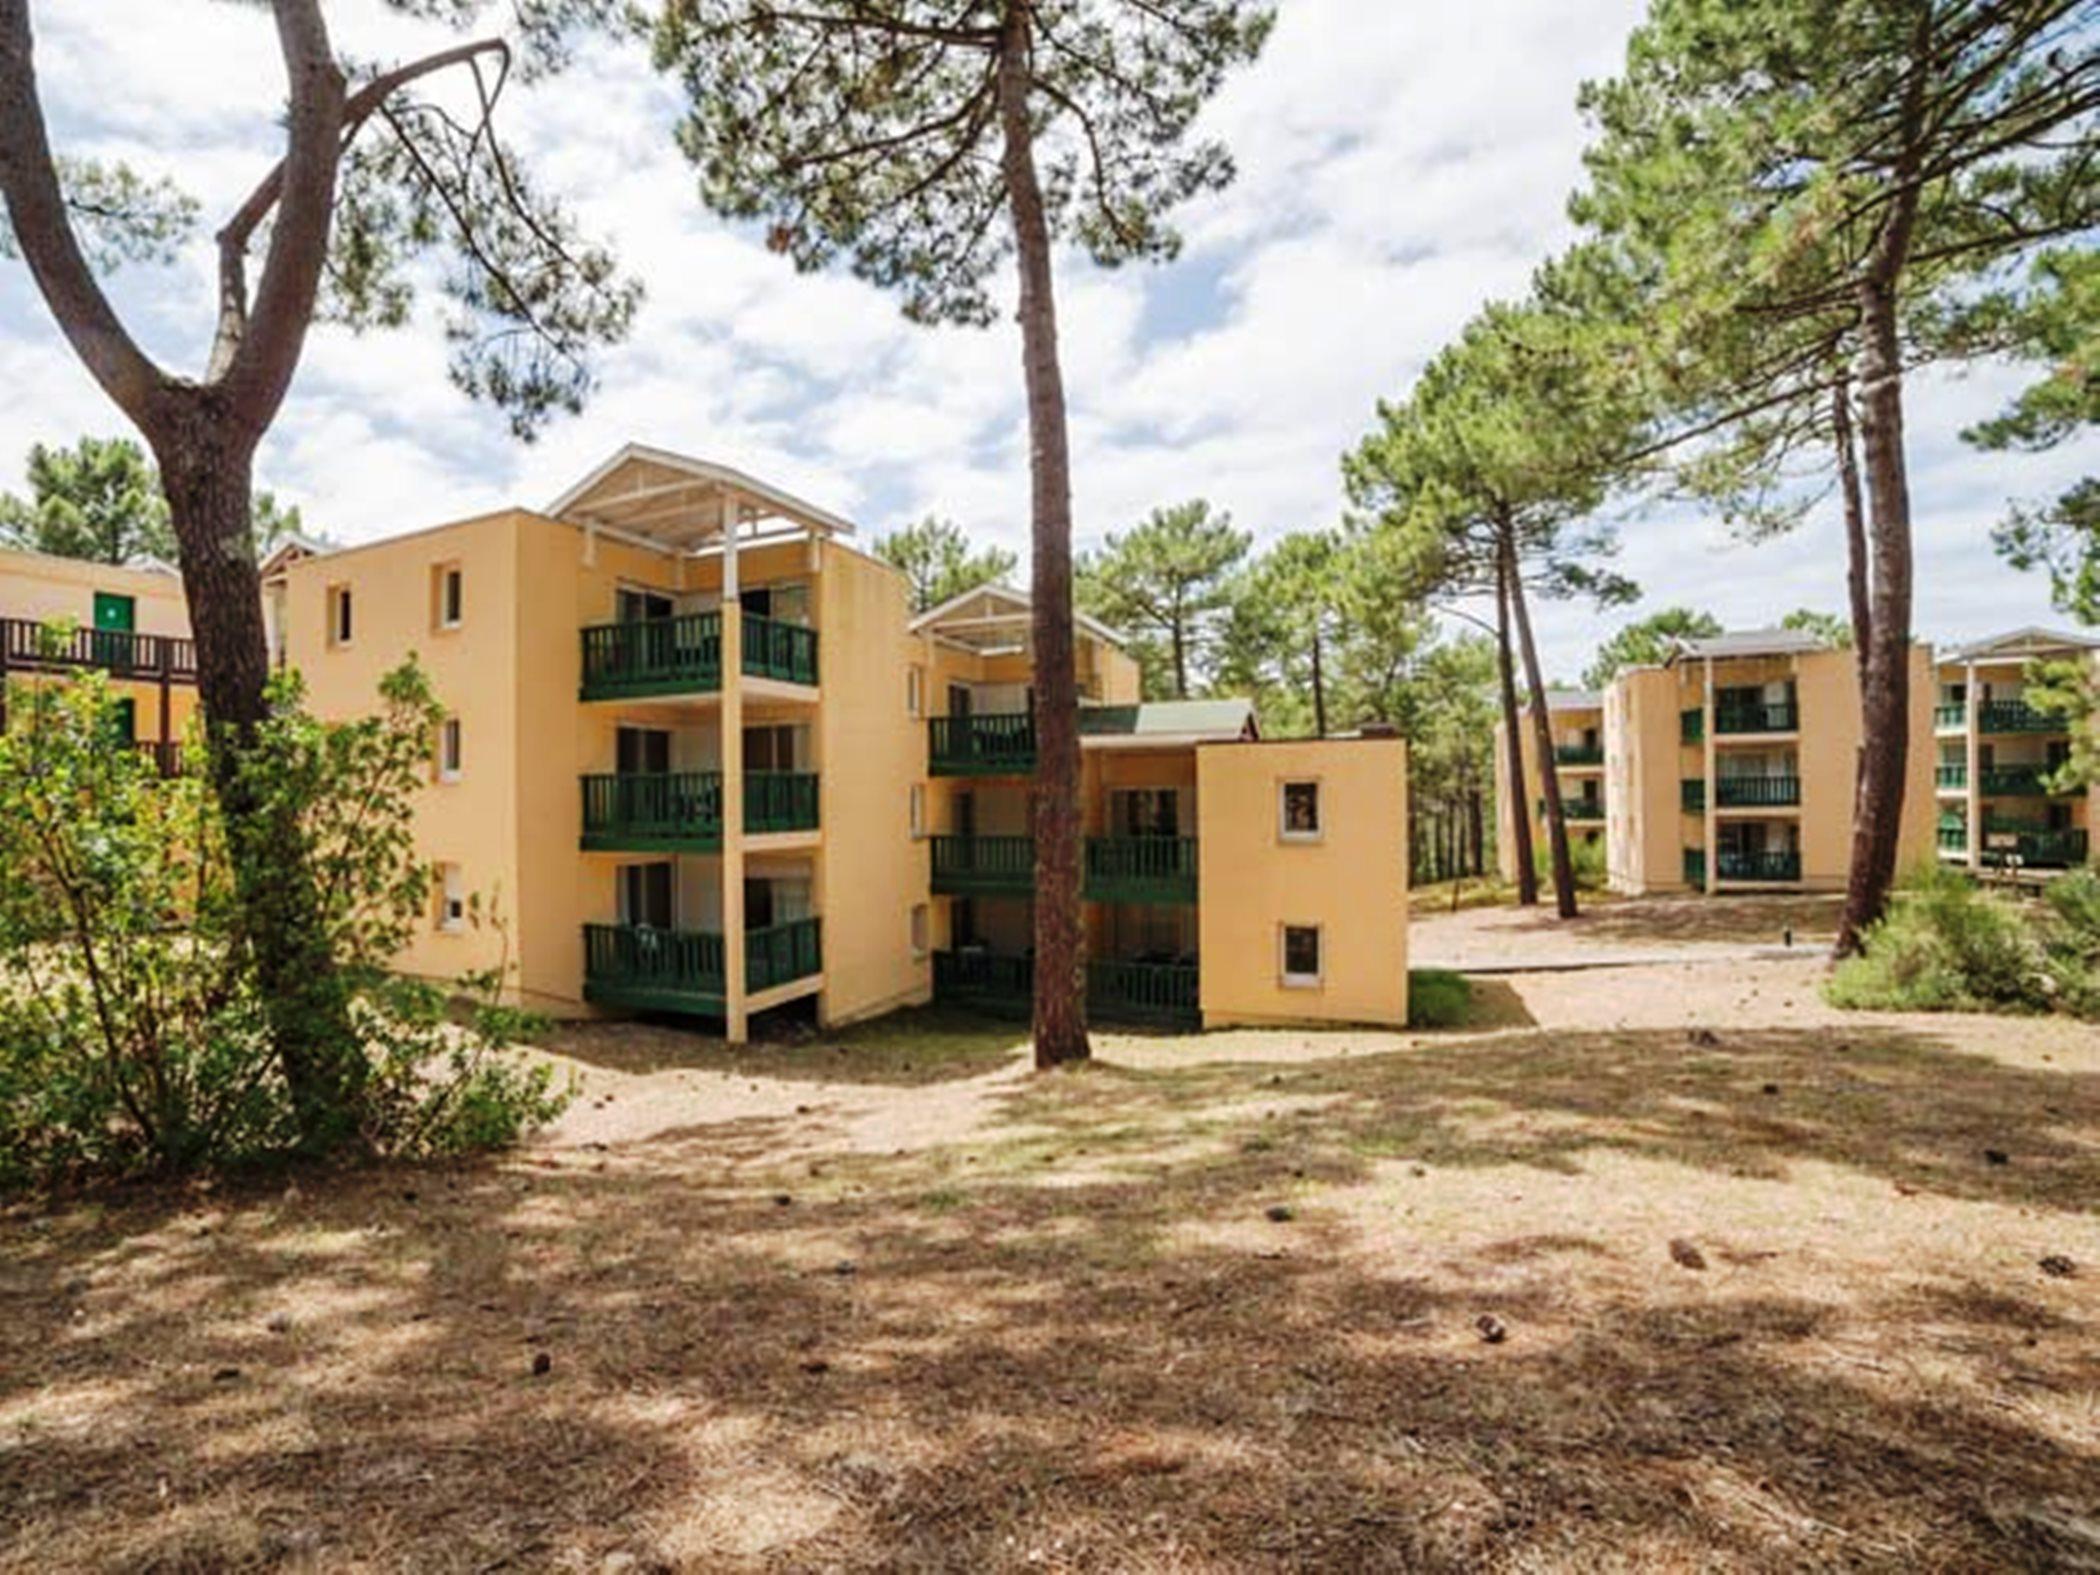 Les Grands Pins, Gironde